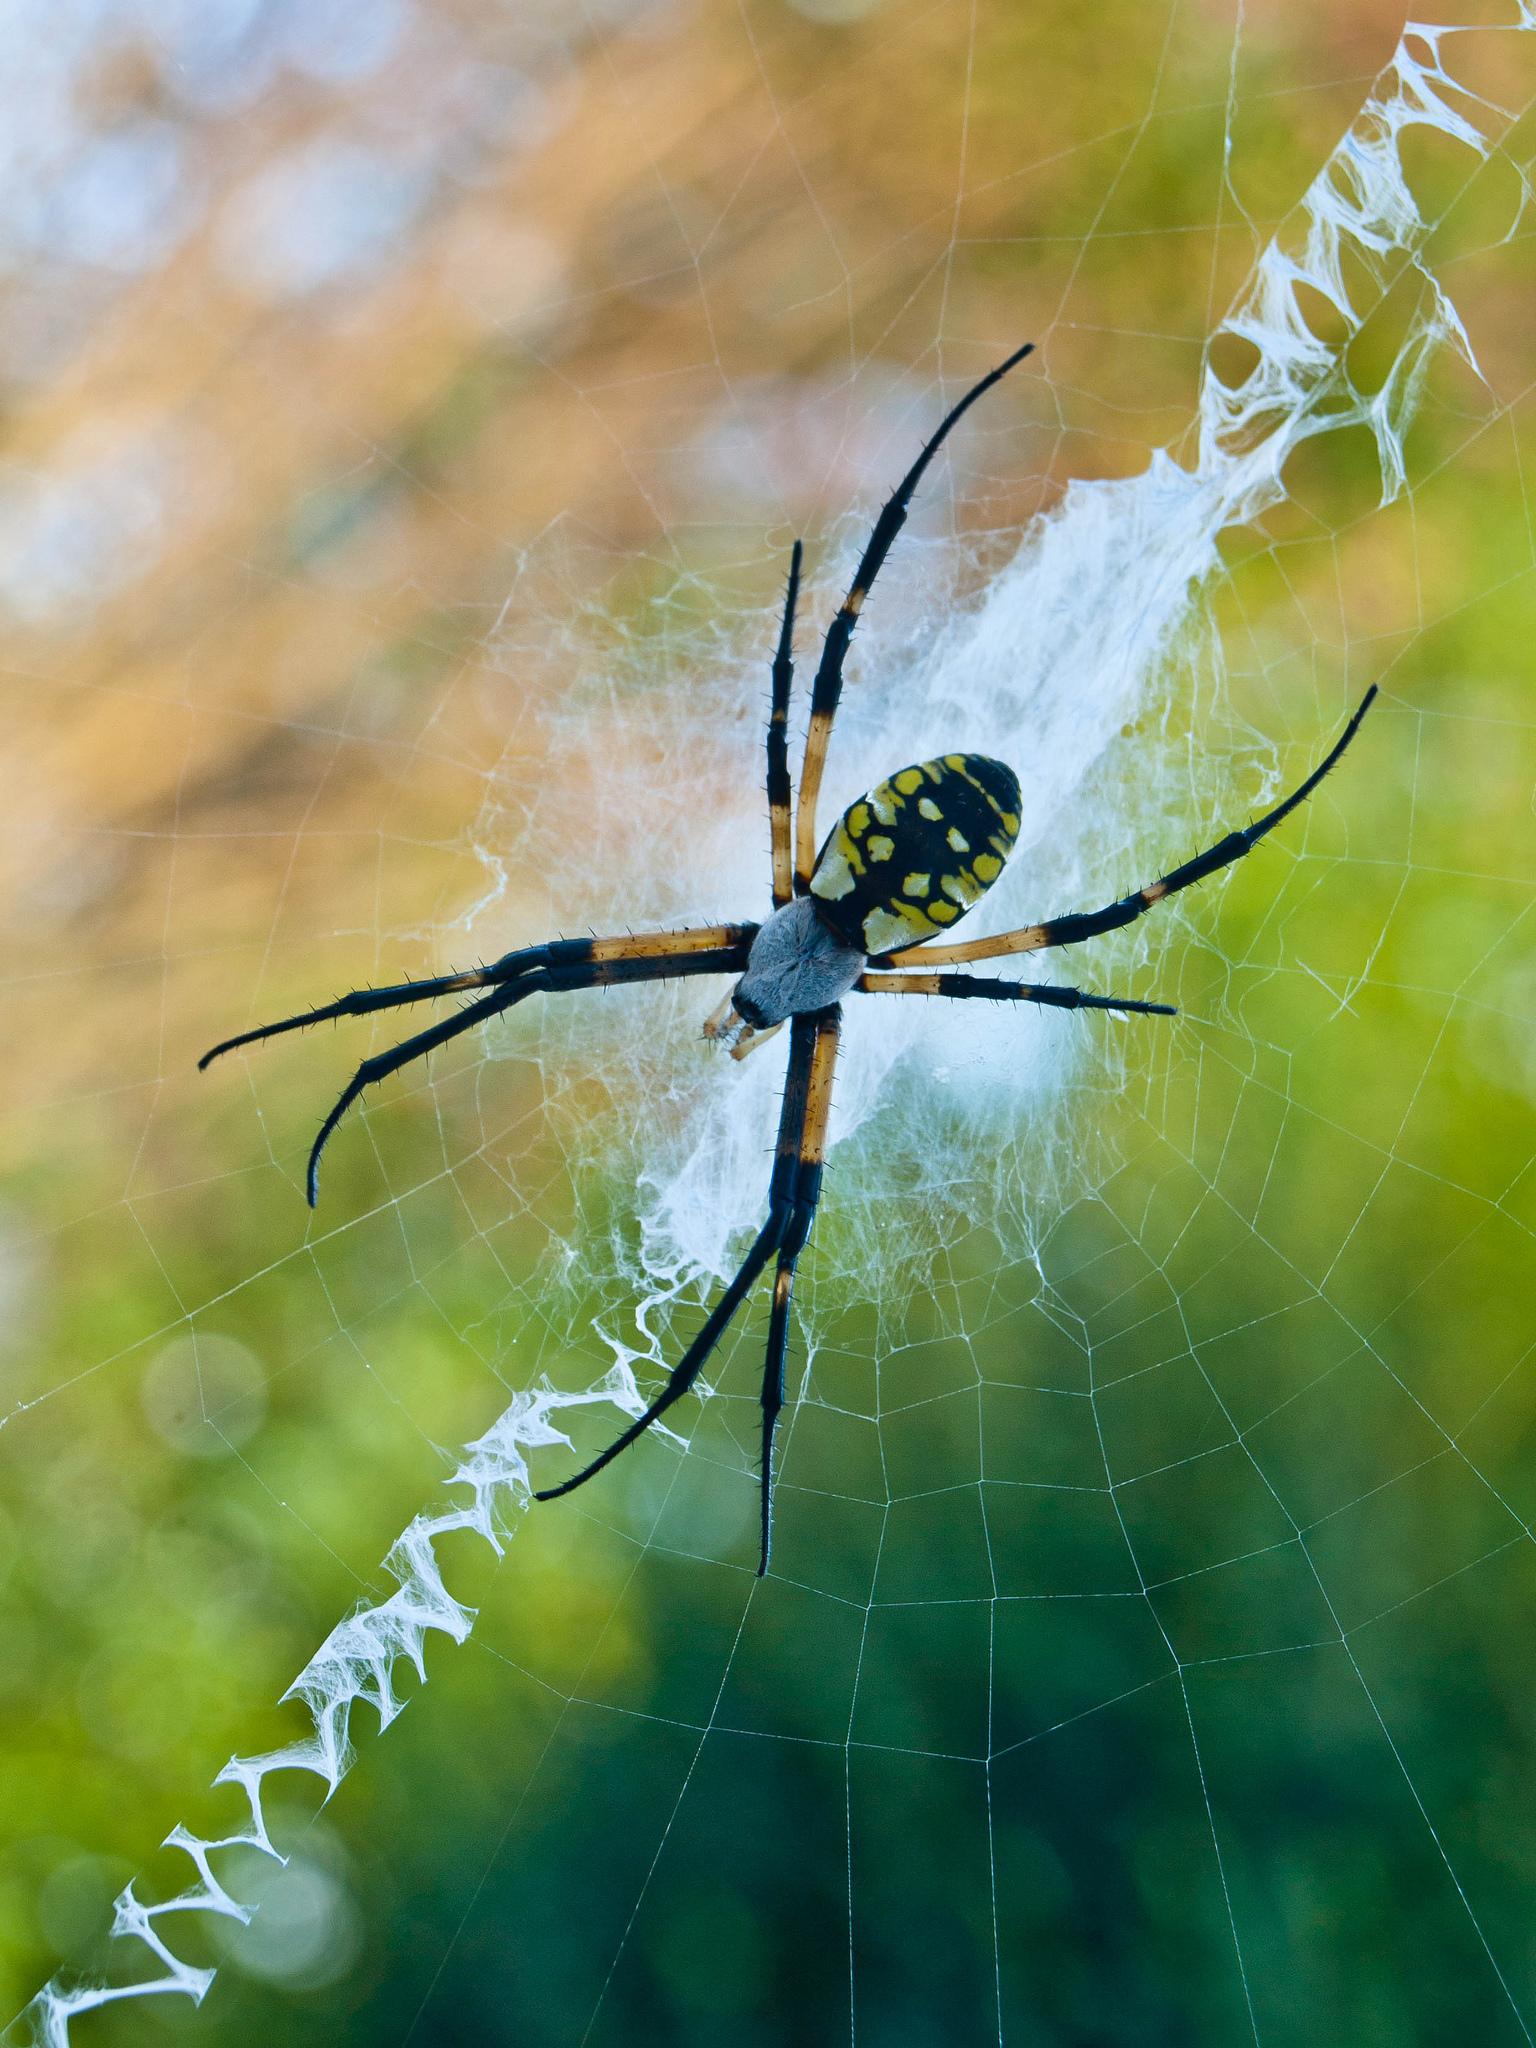 Miss Lady spider